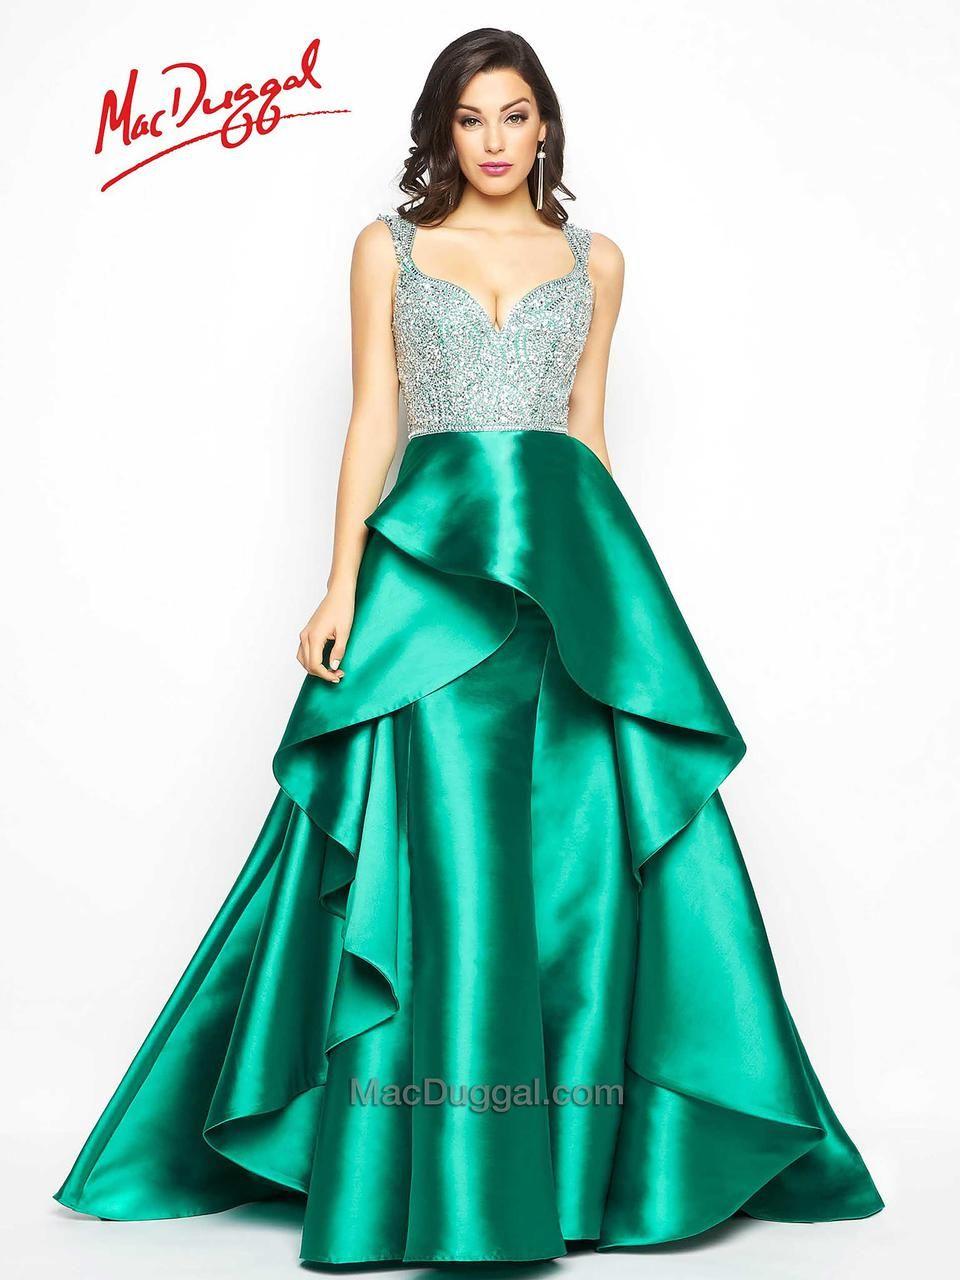 Fine Gojane Prom Dresses Frieze - All Wedding Dresses ...